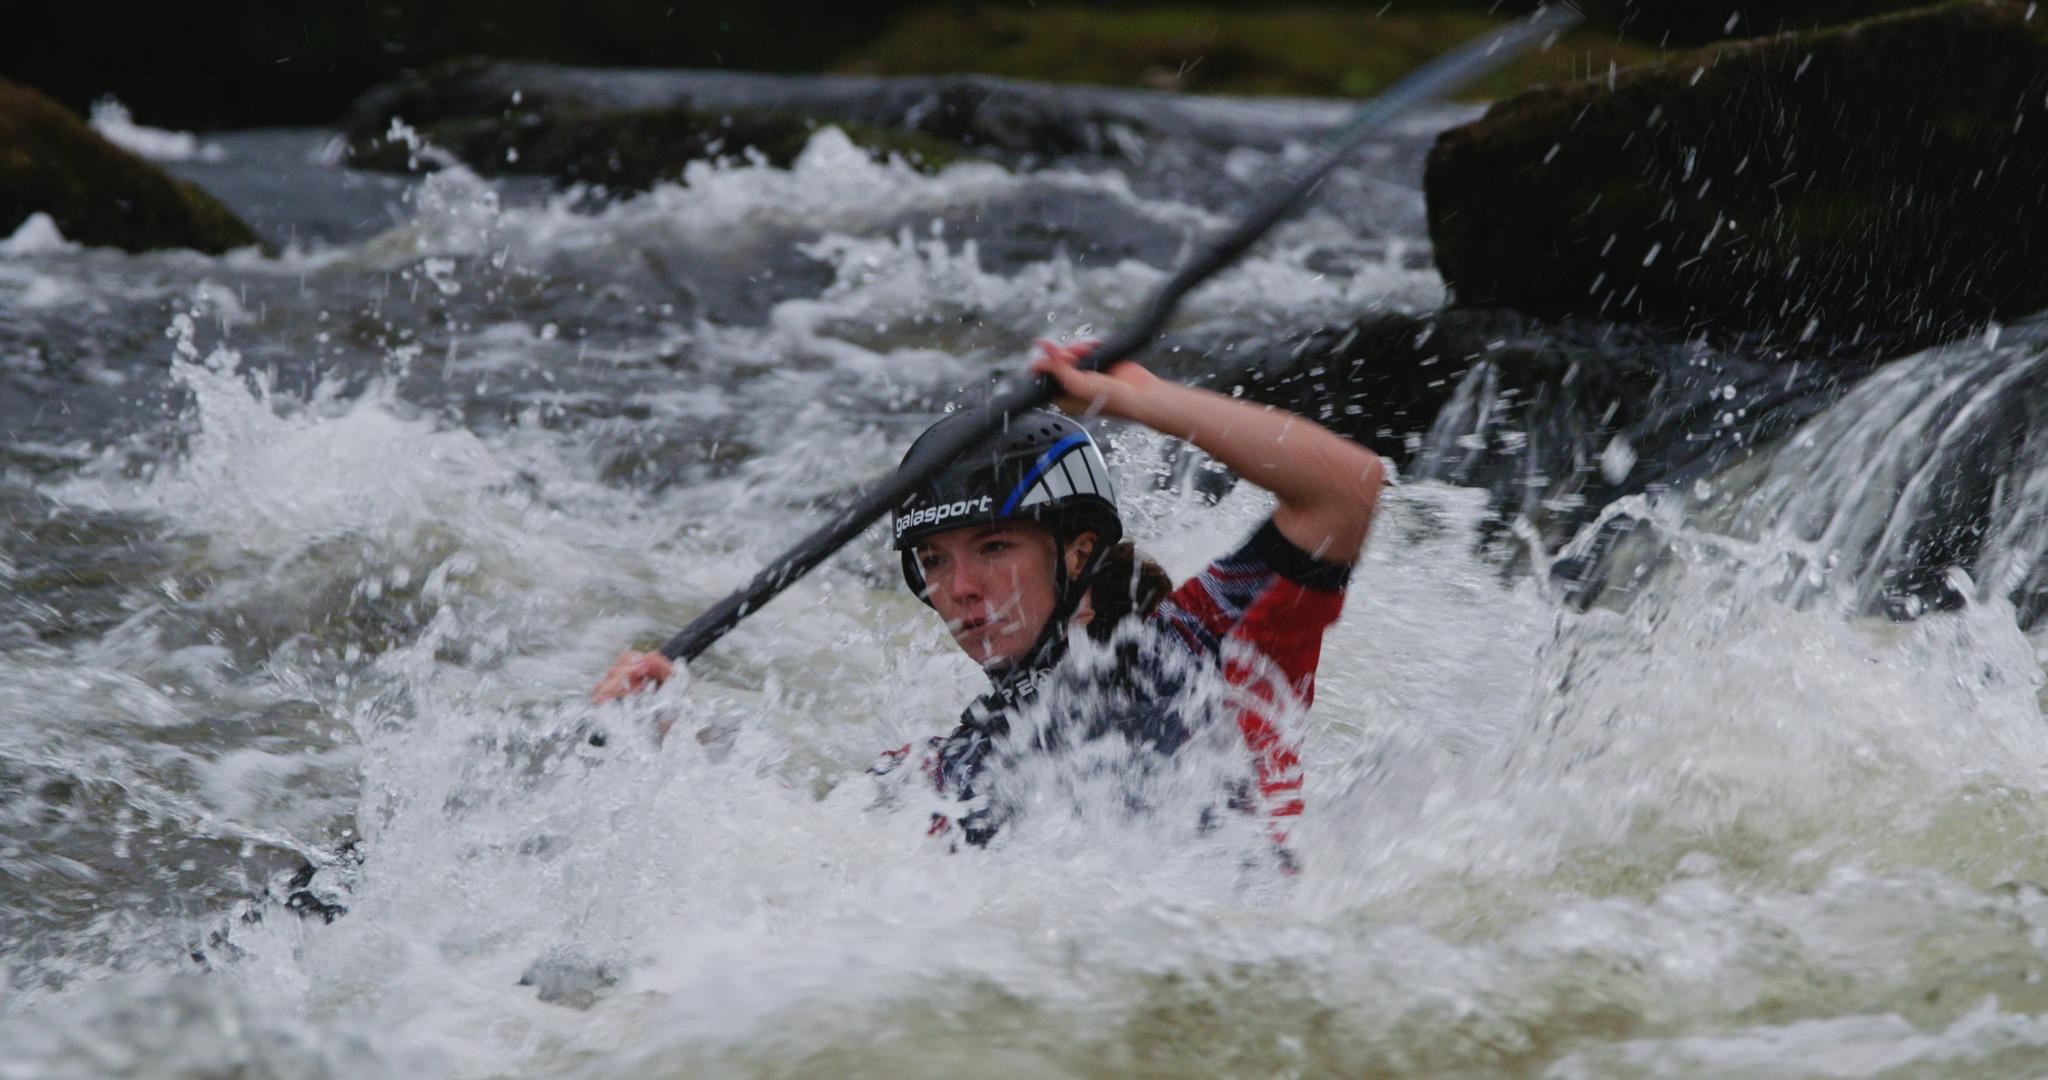 Canoe2.png